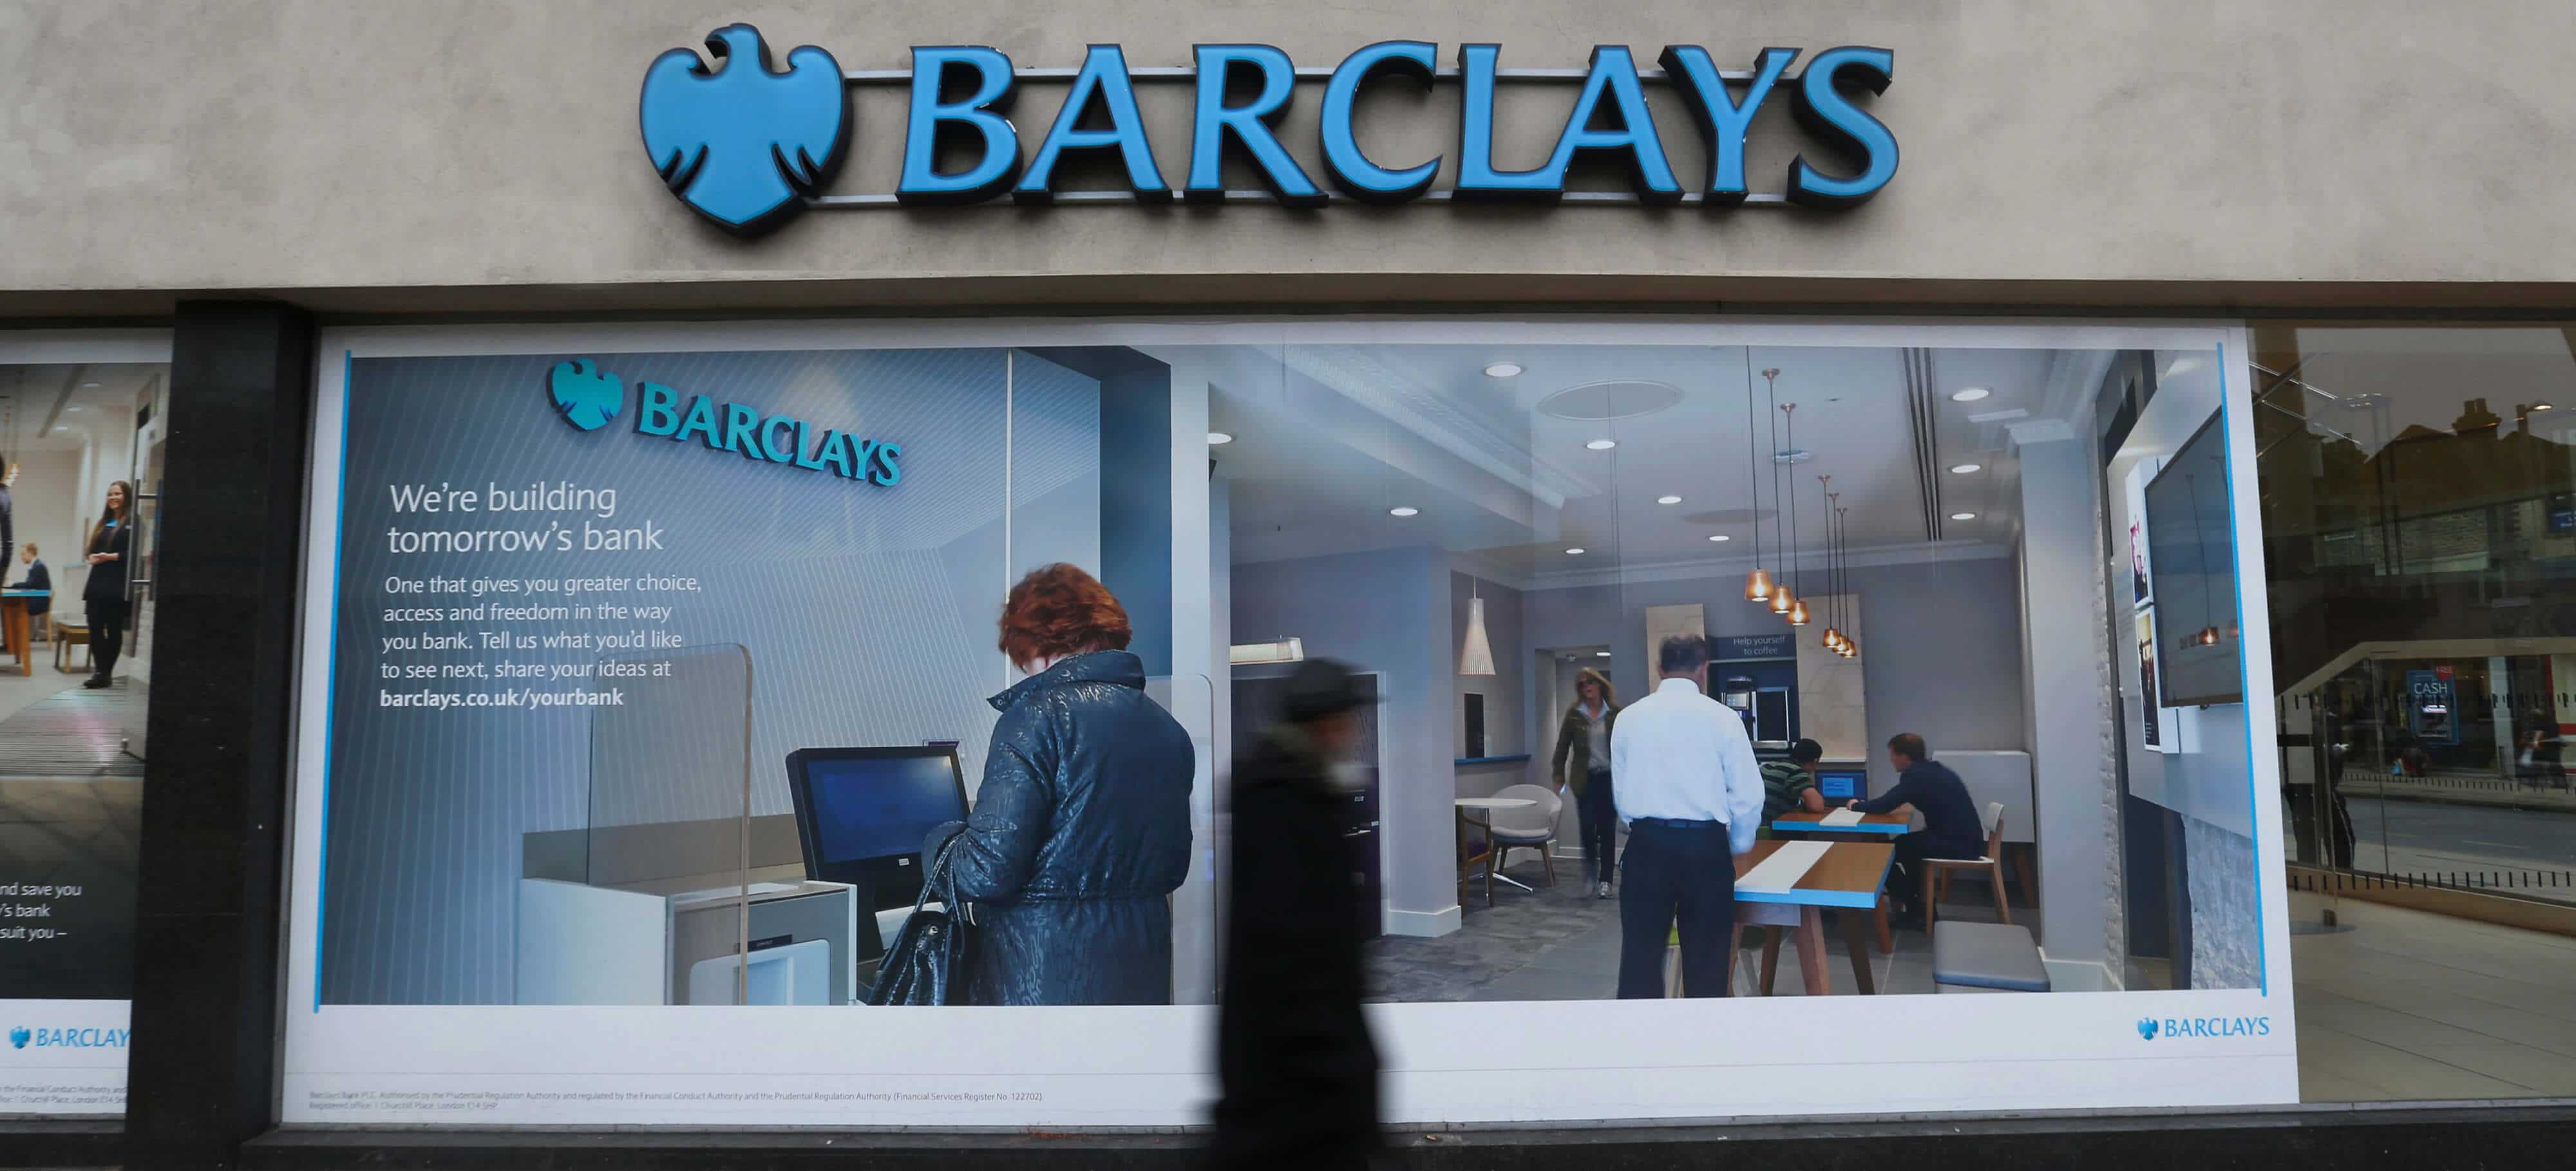 Barclays Plc's Emerging Markets Director, Fadi Attia, Parts Ways with Bank